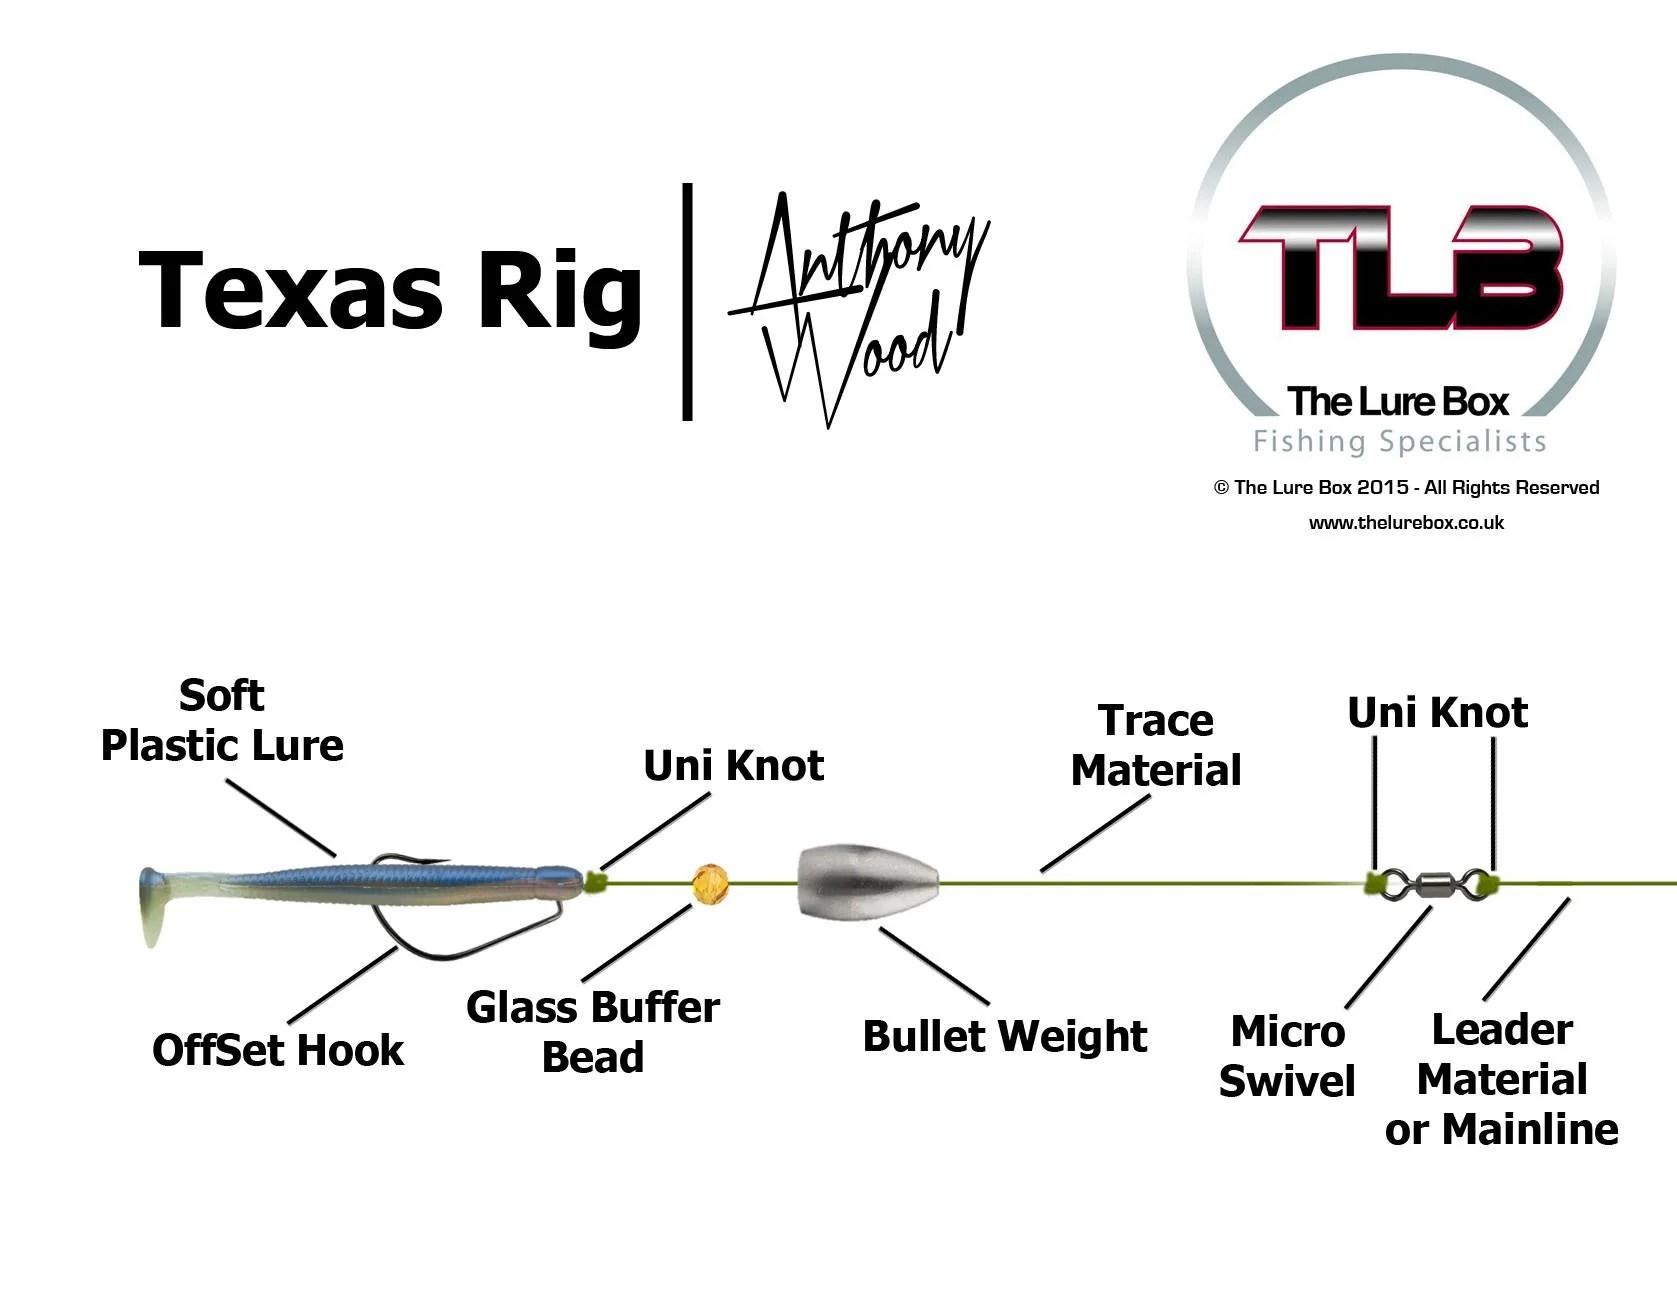 Texas Rig Diagram | Lure Fishing Technique | The Lure Box